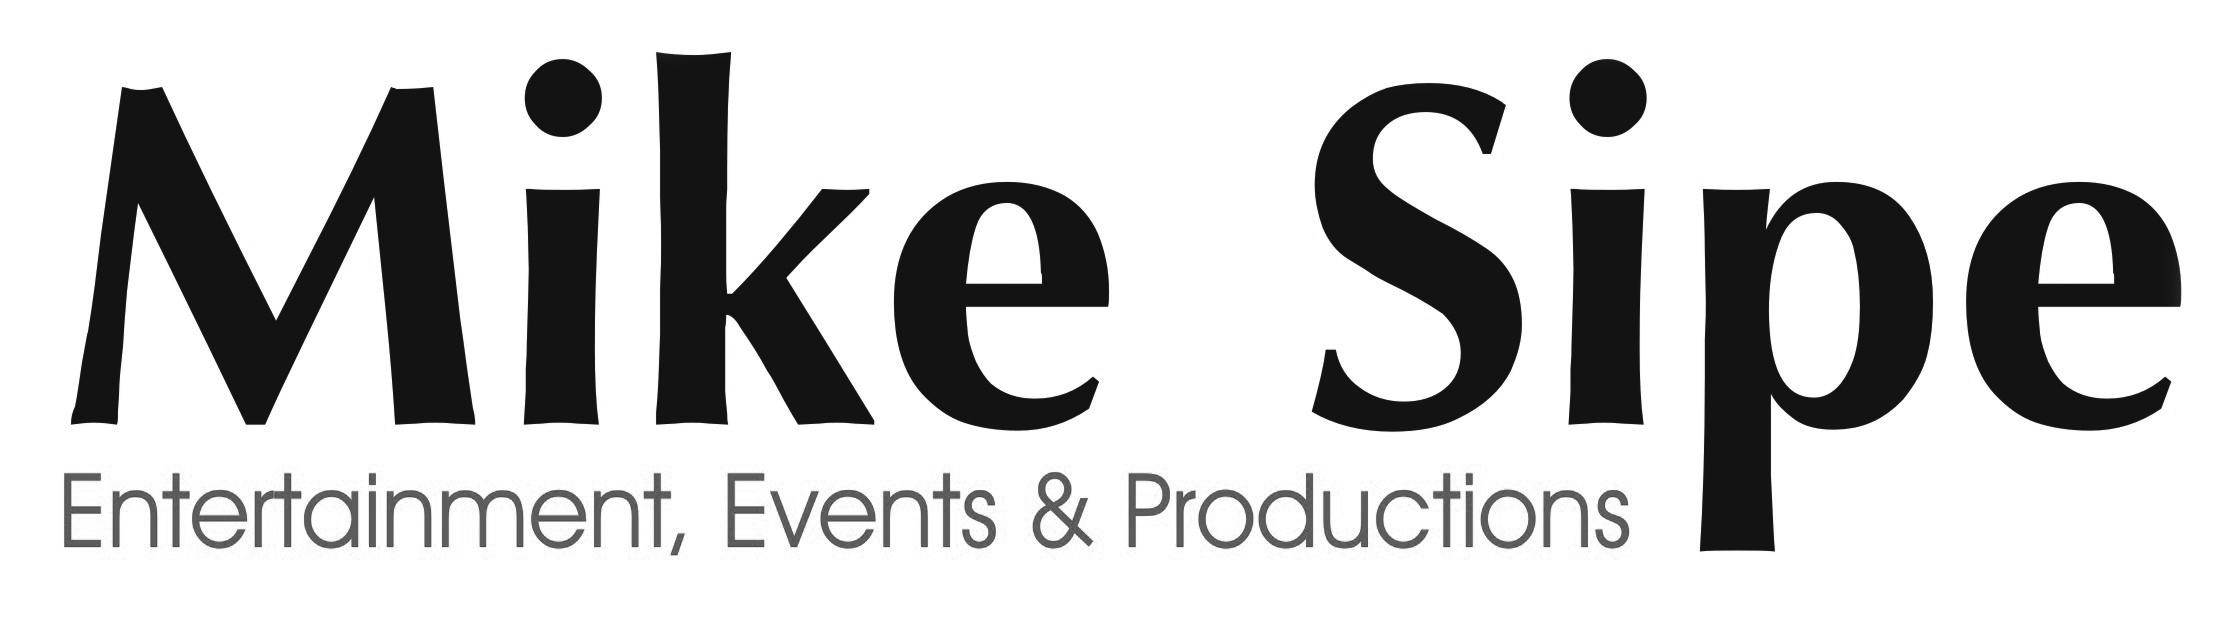 Mike logo Greyscale.jpg